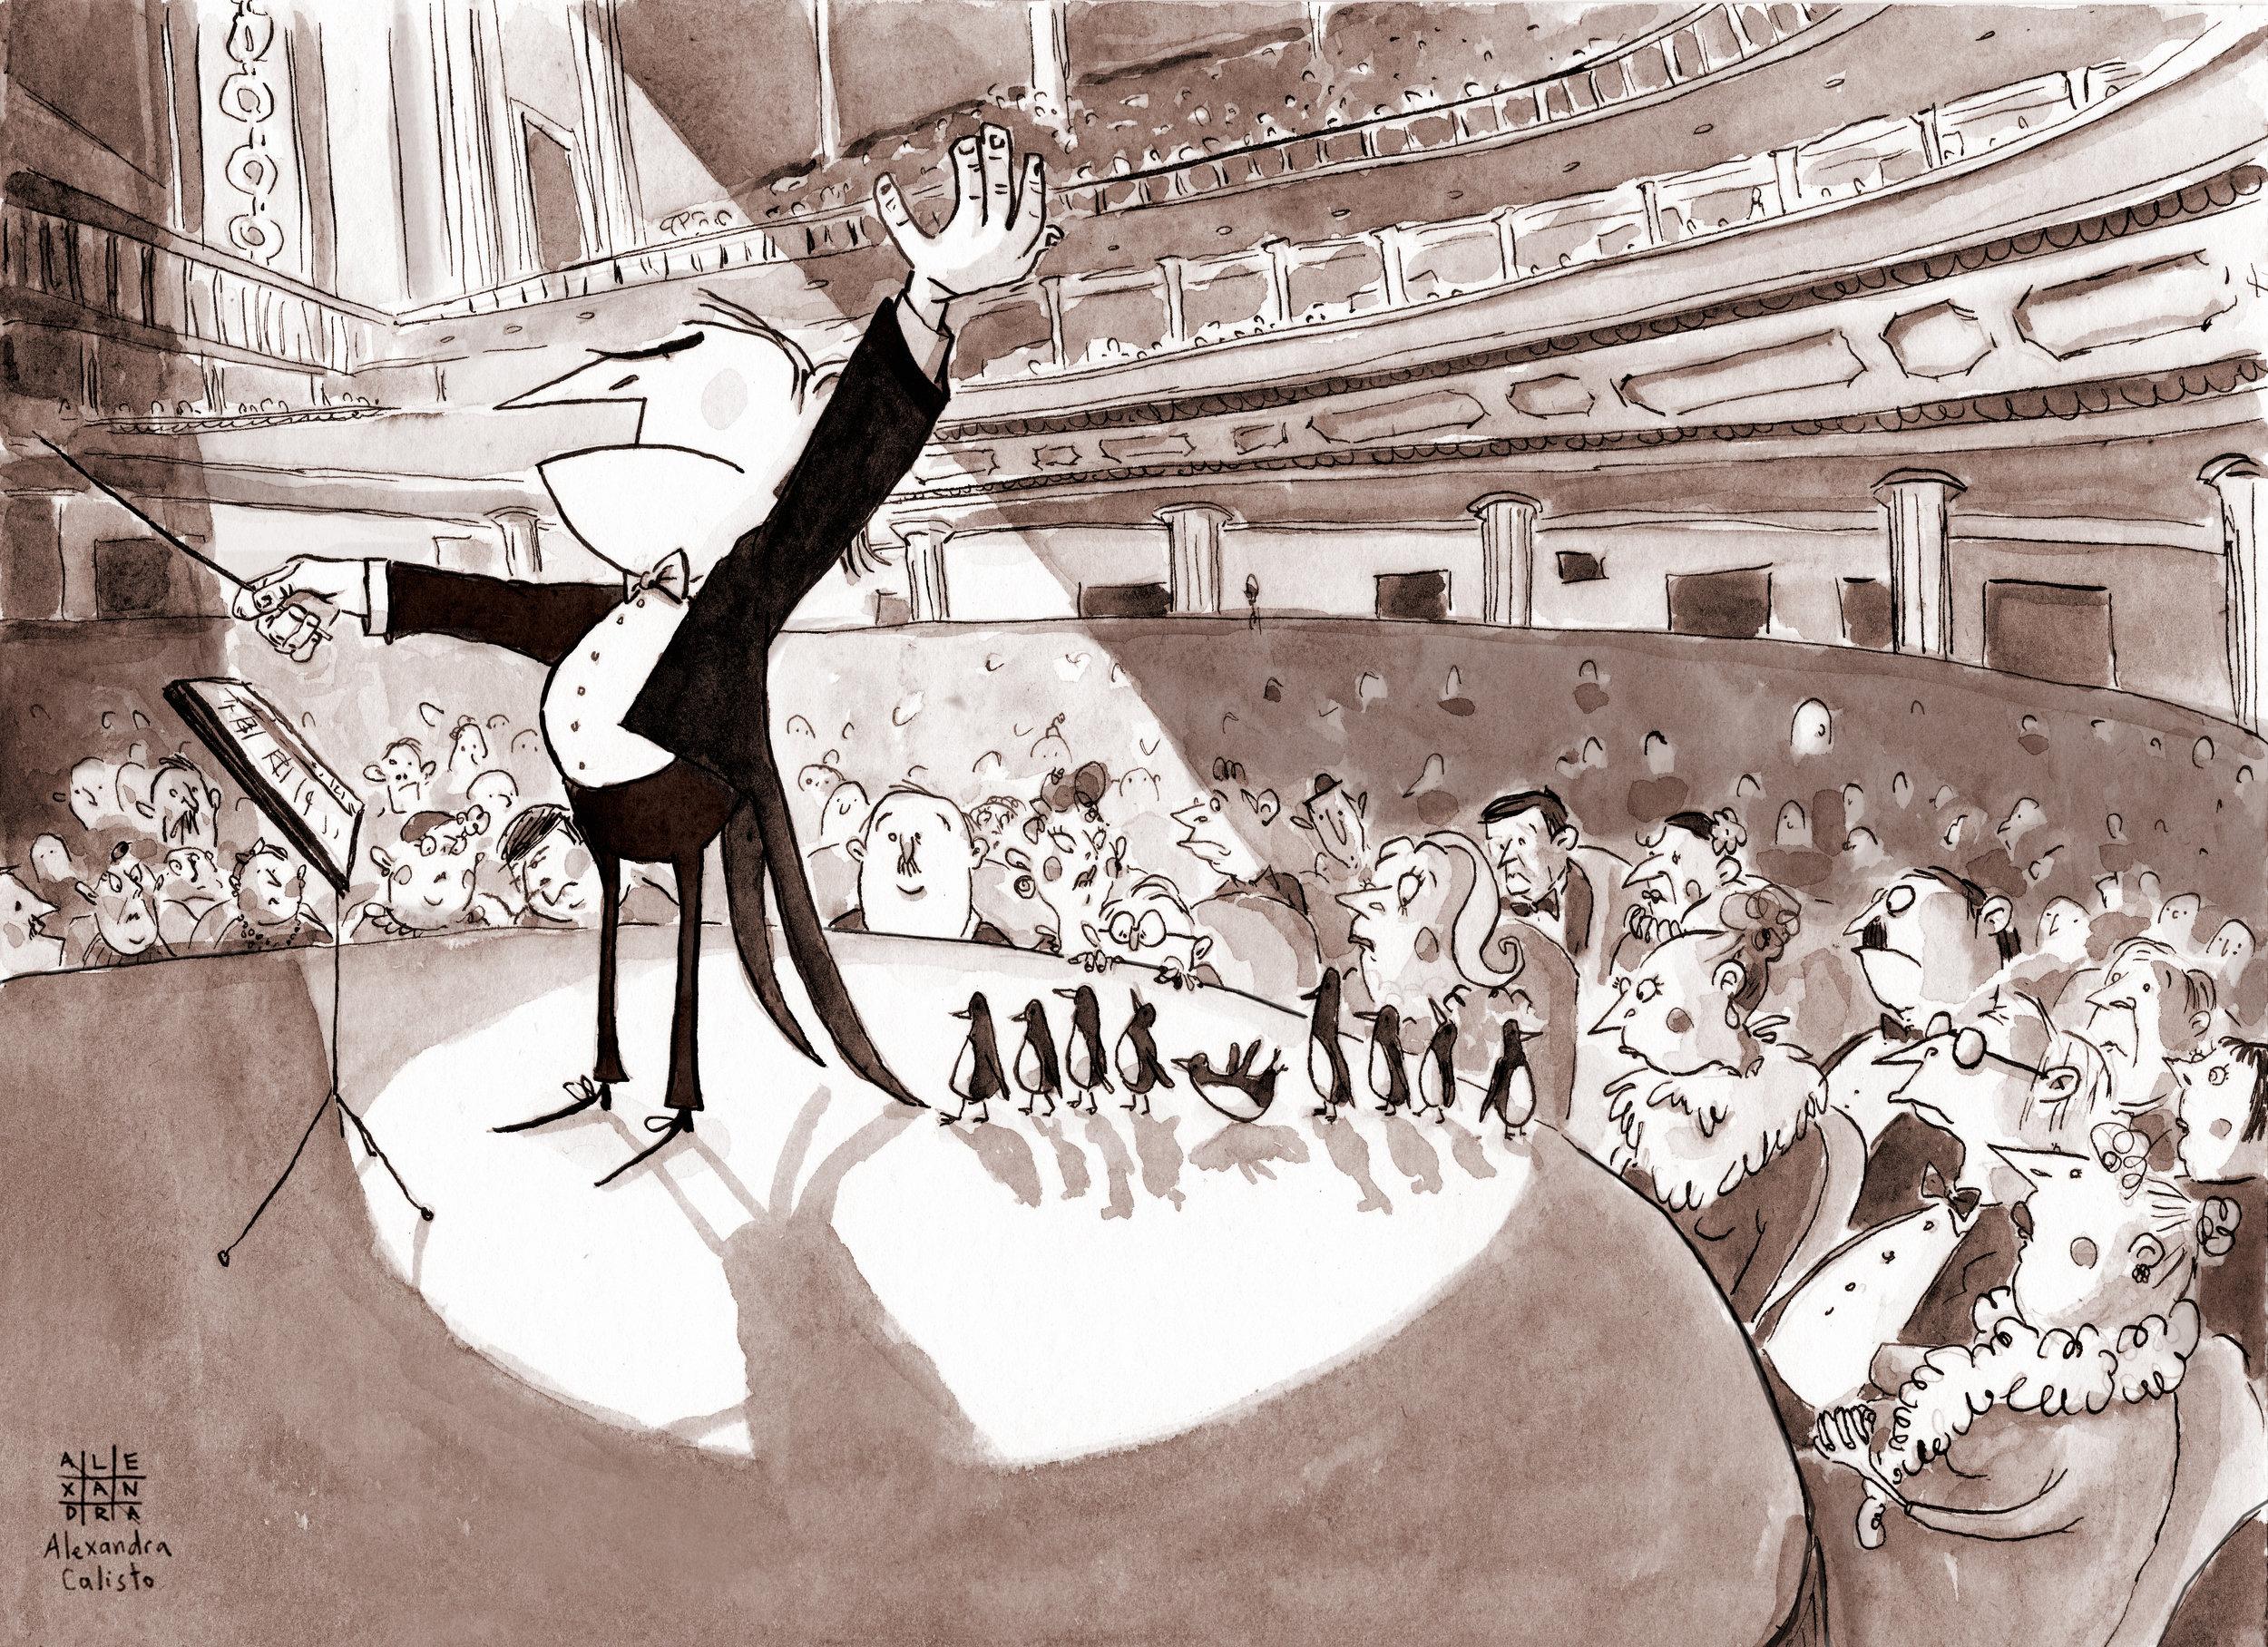 illustration, ink, inktober, tinta china, alexandra calisto, meastro, orchestra, penguins, cute, stage